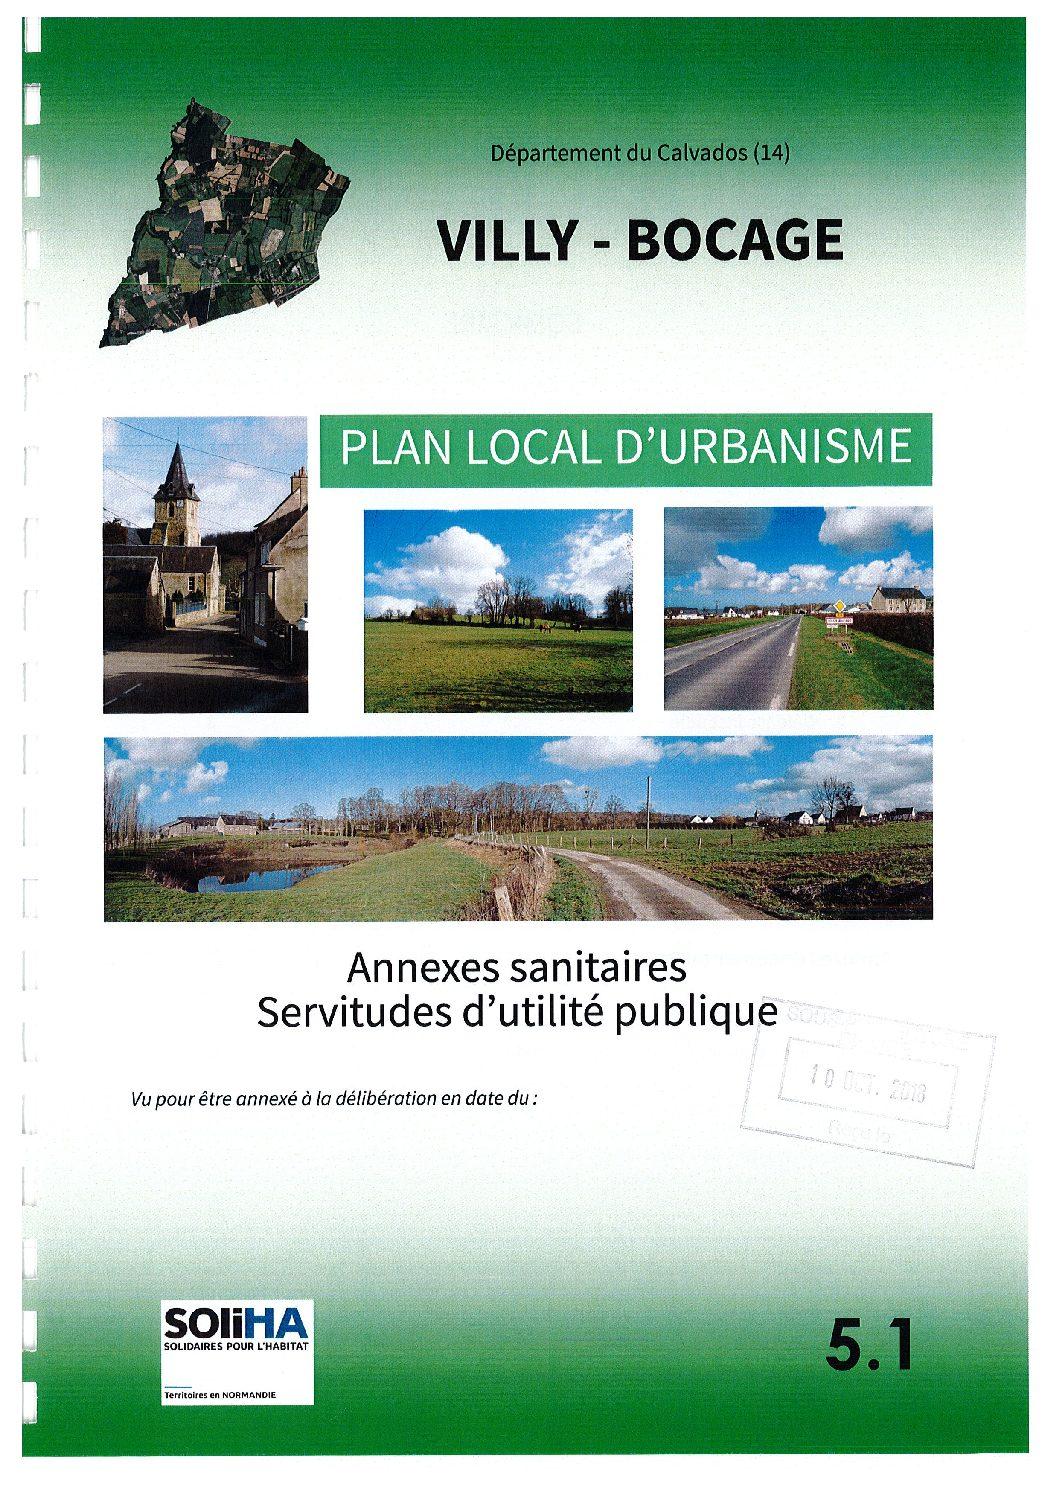 Villy-Bocage : Annexes sanitaires – Servitudes